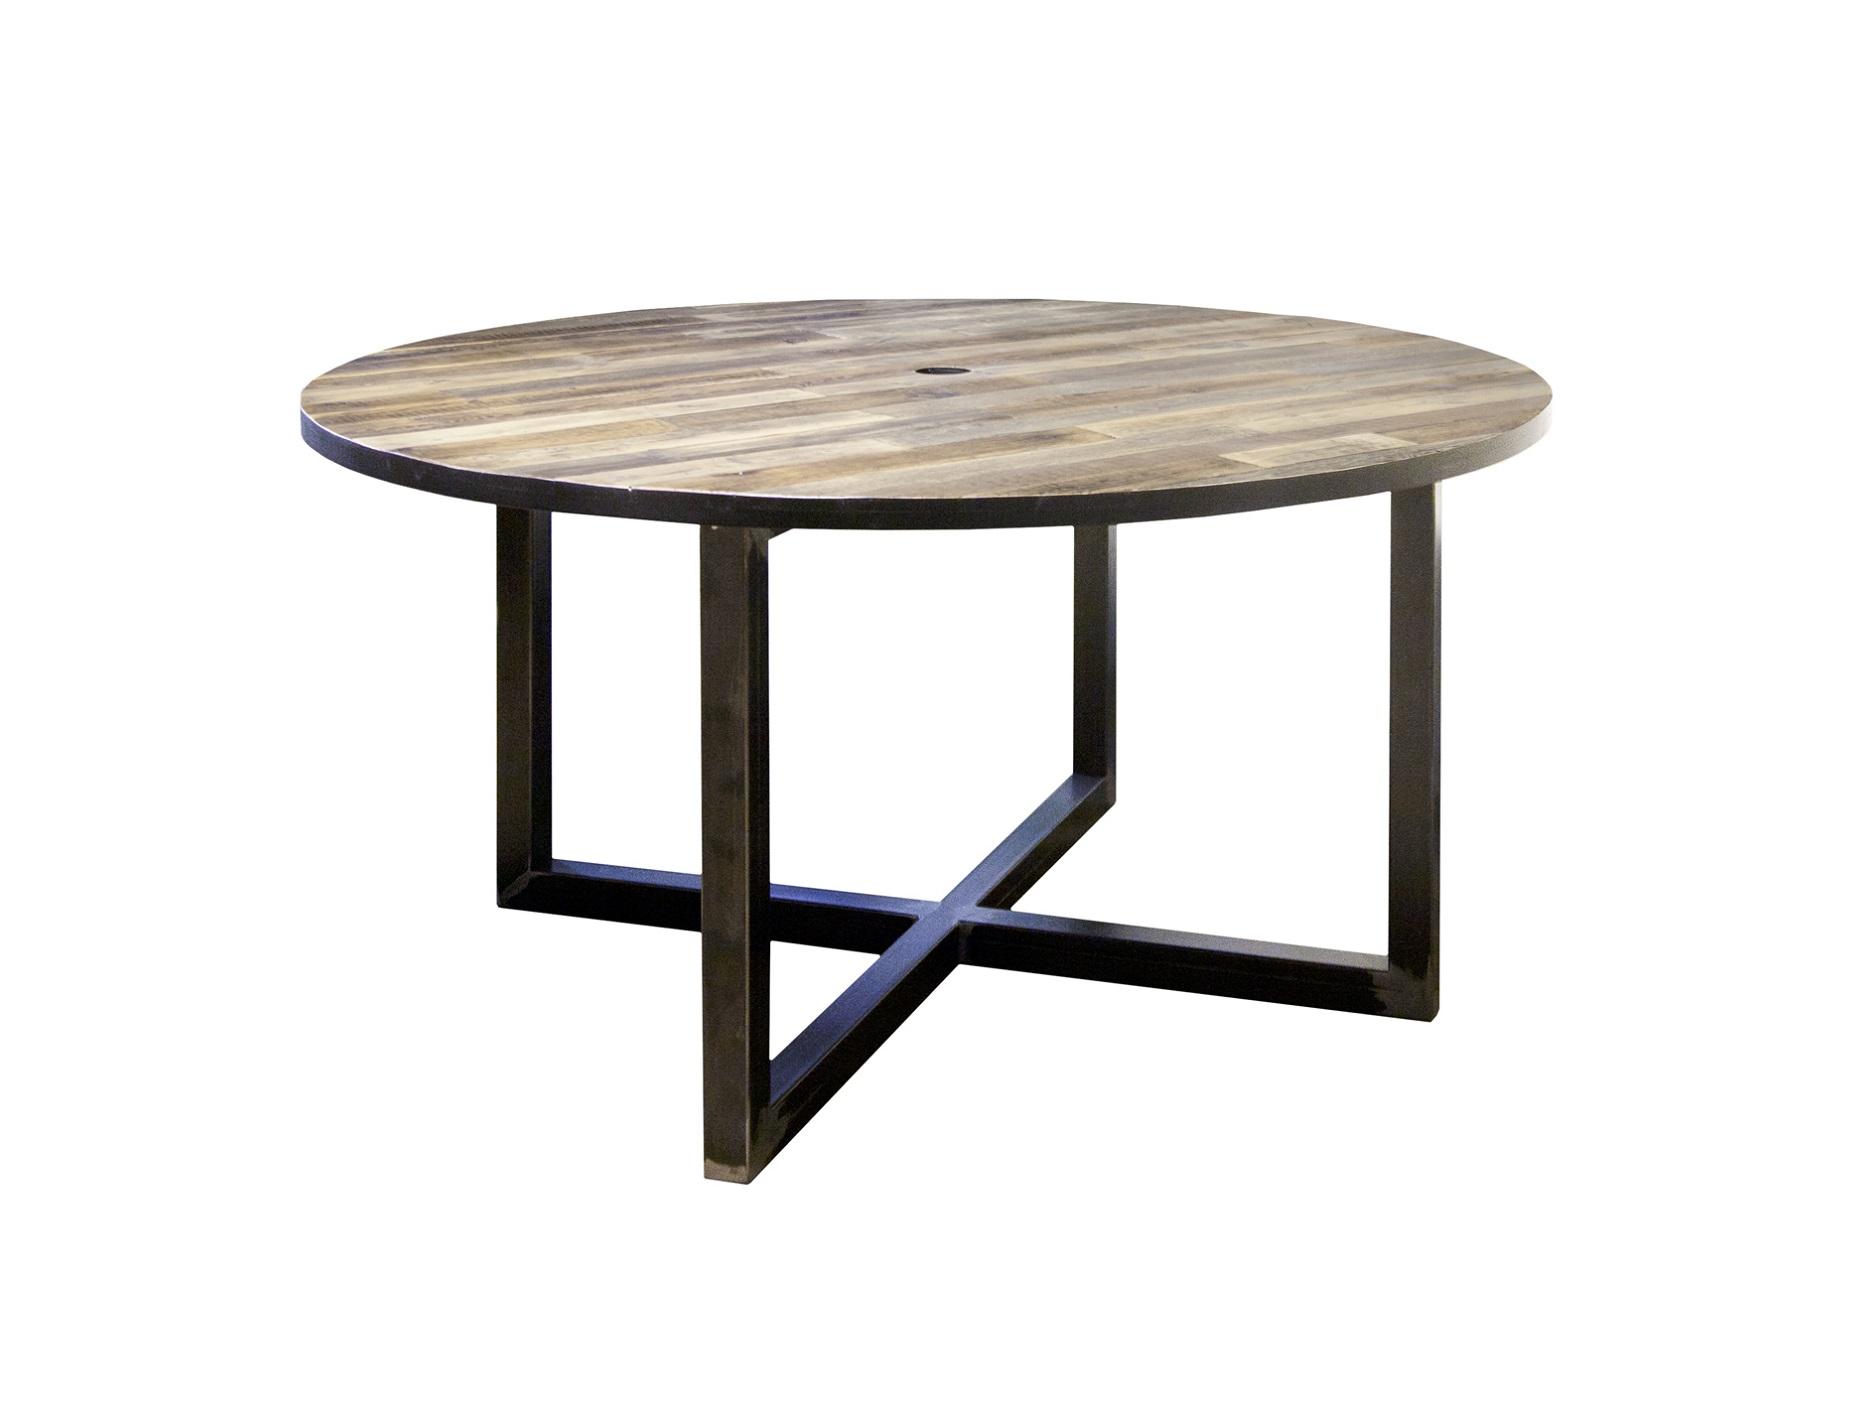 Кухонный стол Archpole 15429871 от thefurnish